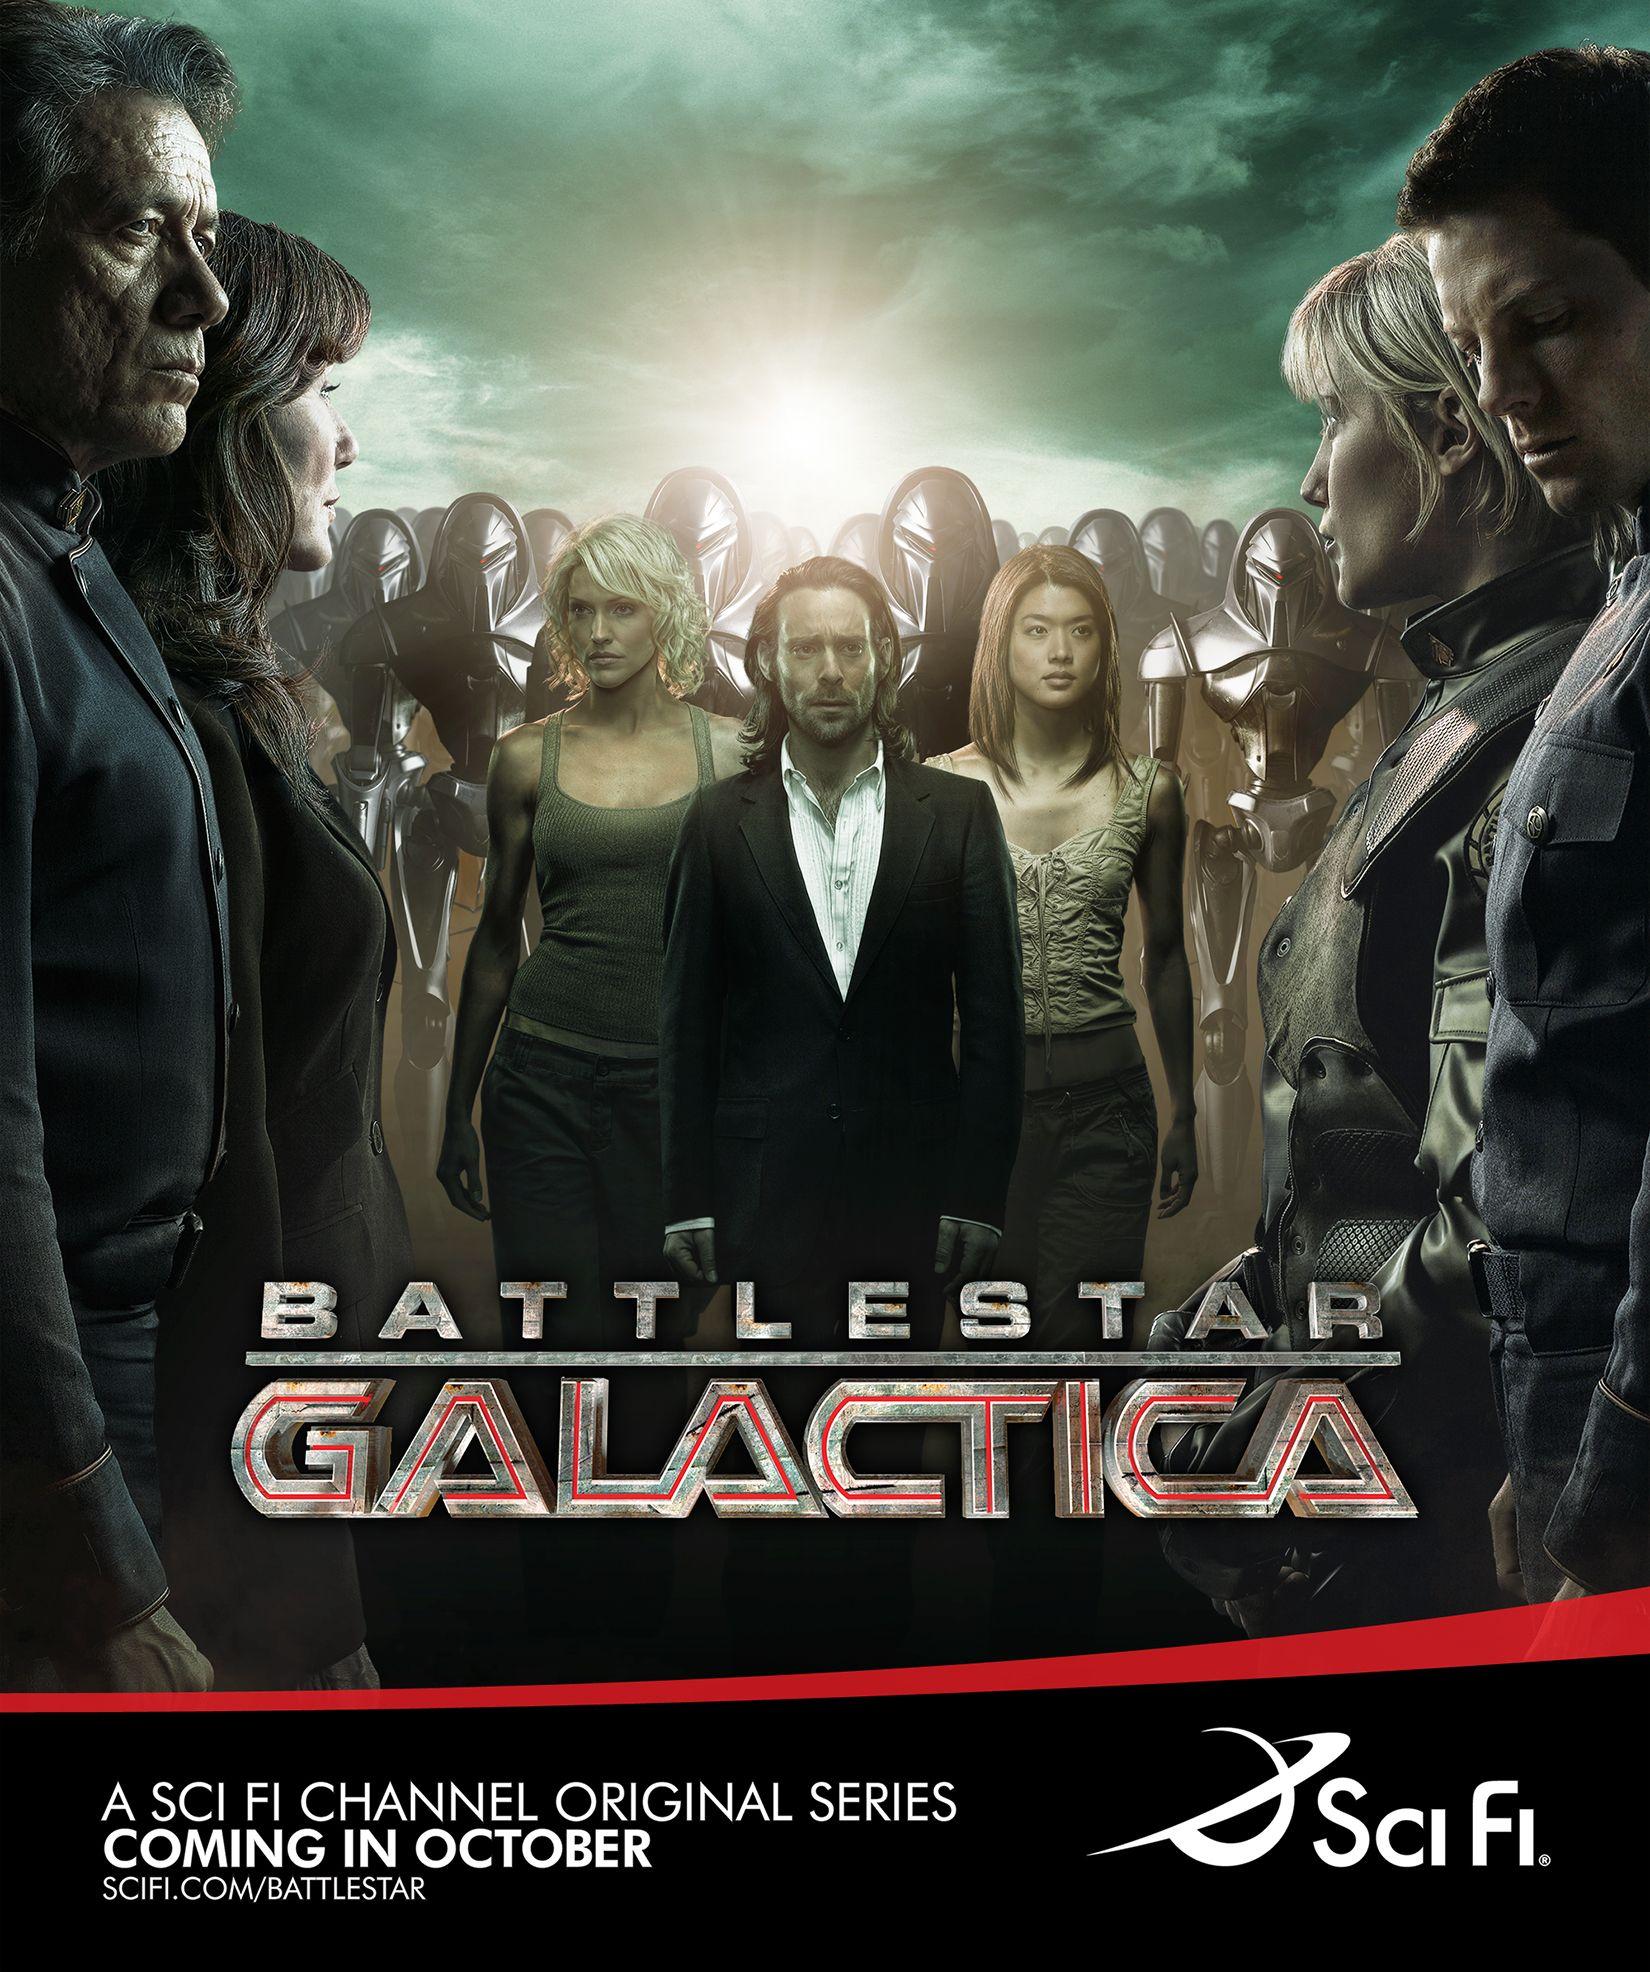 Battlestar Galactica Poster Battlestar Galactica Sci Fi Tv